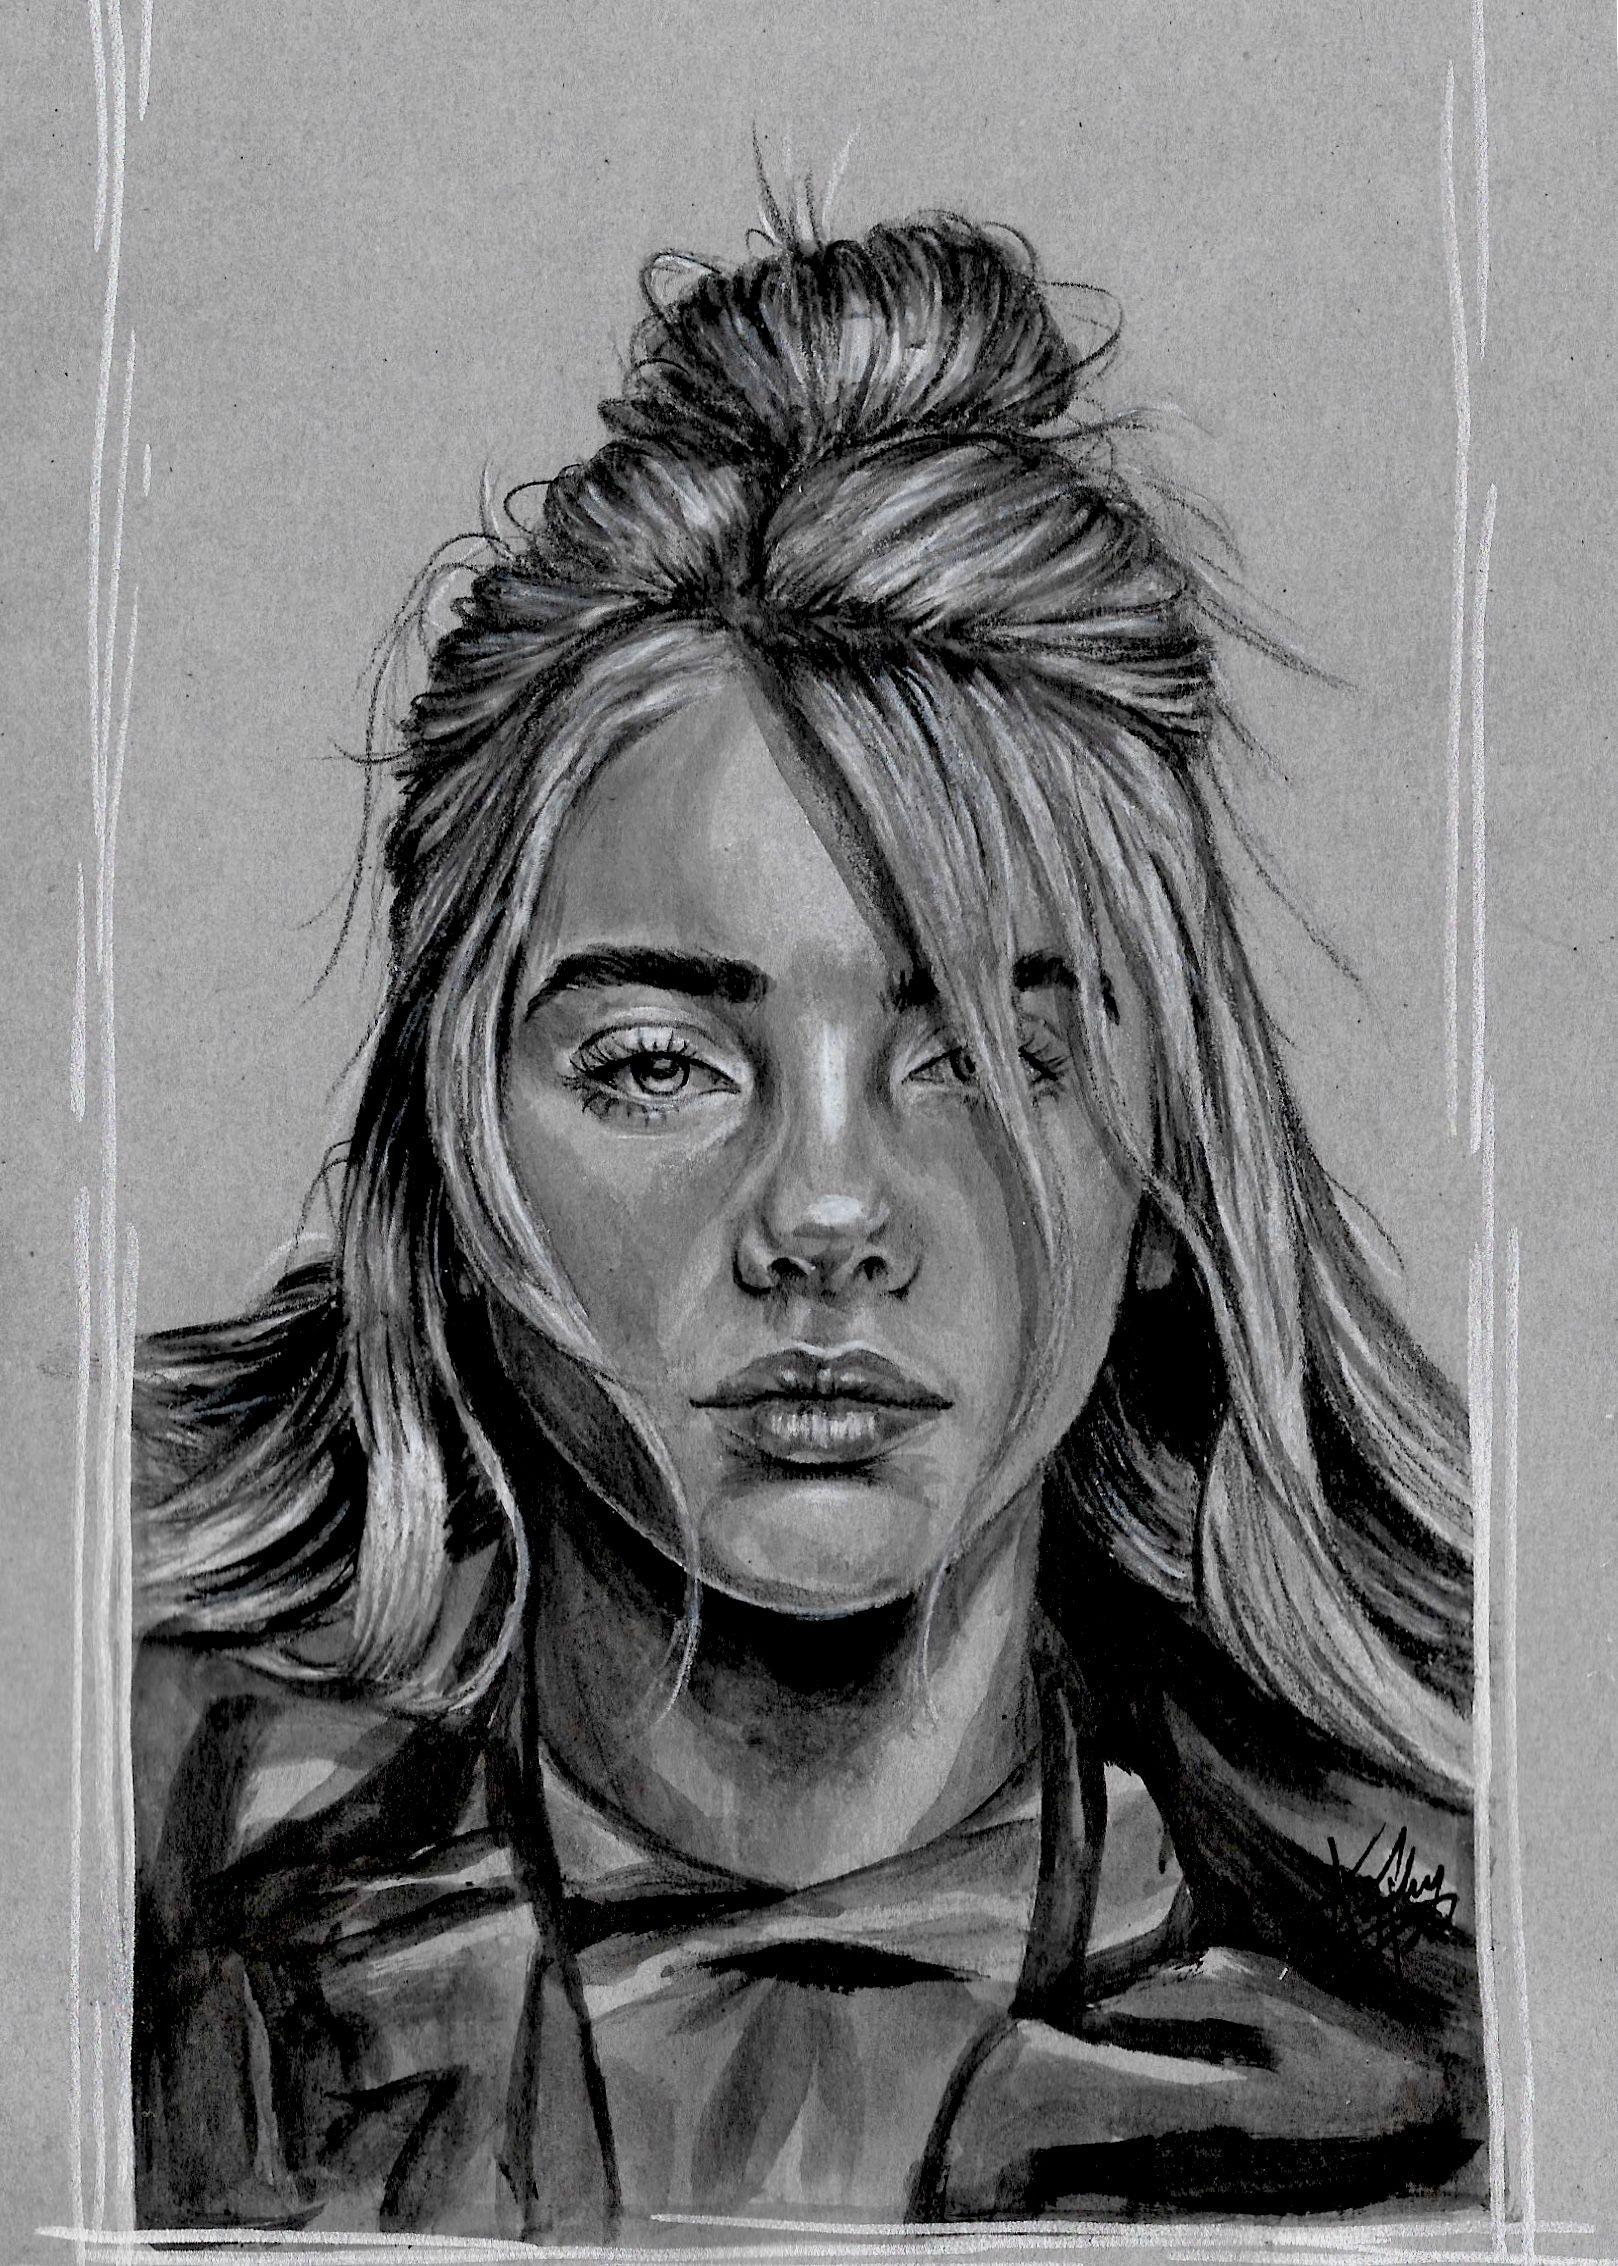 """billie eilish"" signed print  Πορτρέτο με μολύβι Σκίτσα"